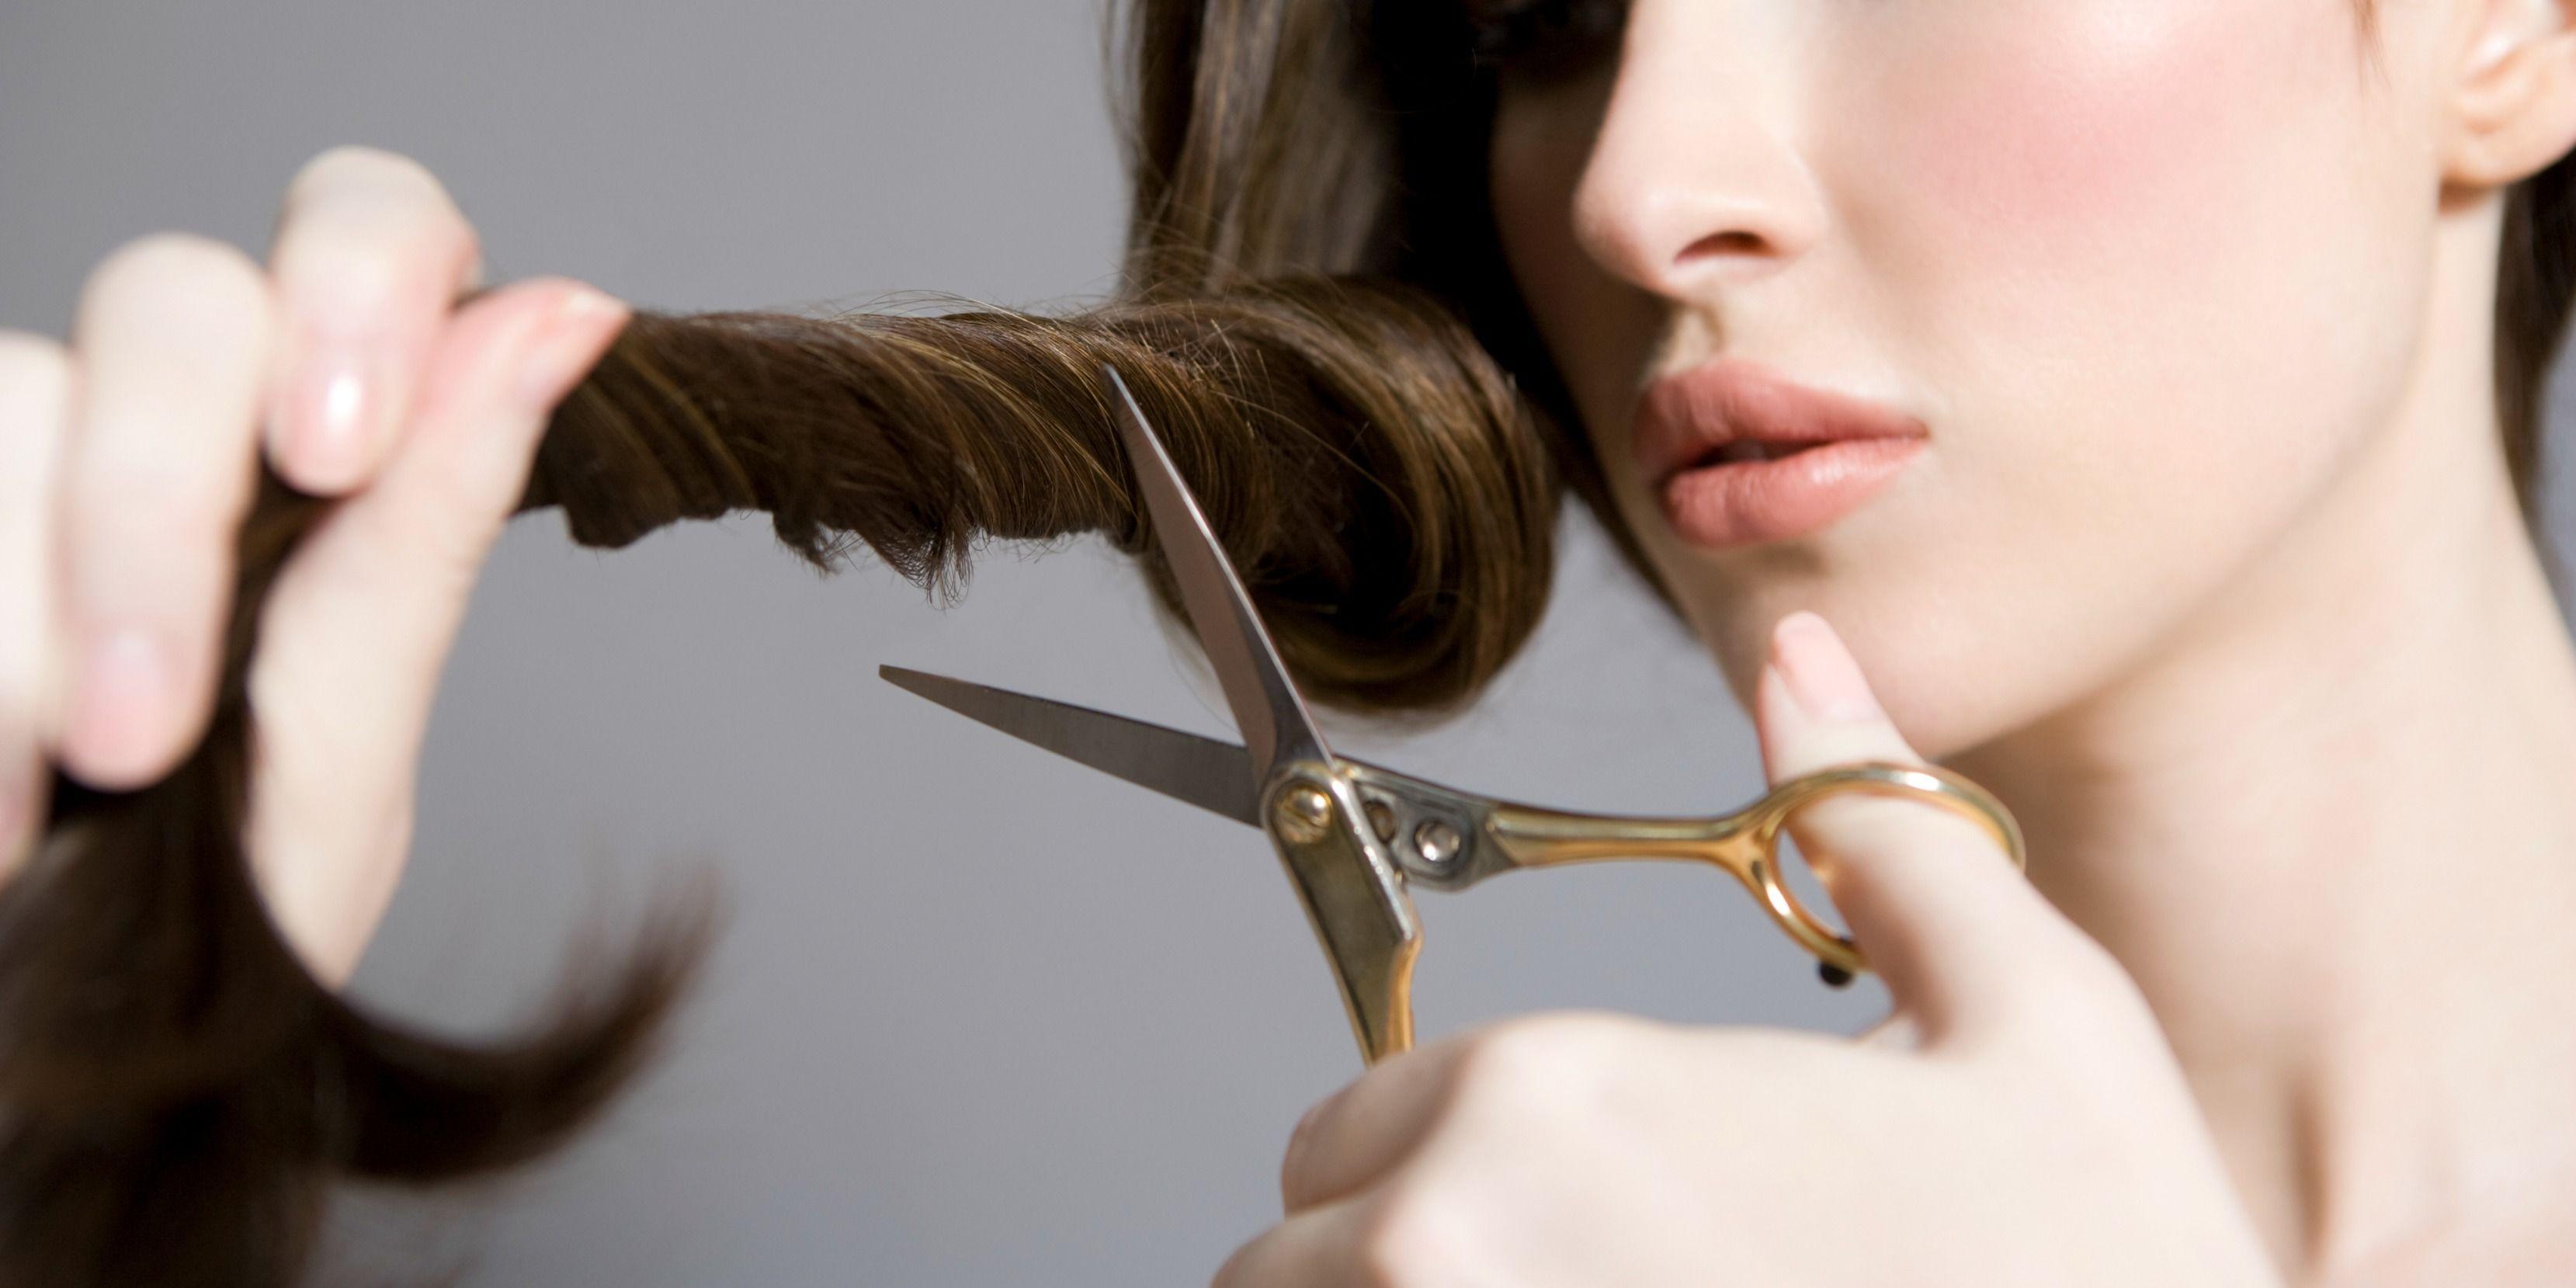 You should never cut your own hair diy haircut advice solutioingenieria Gallery